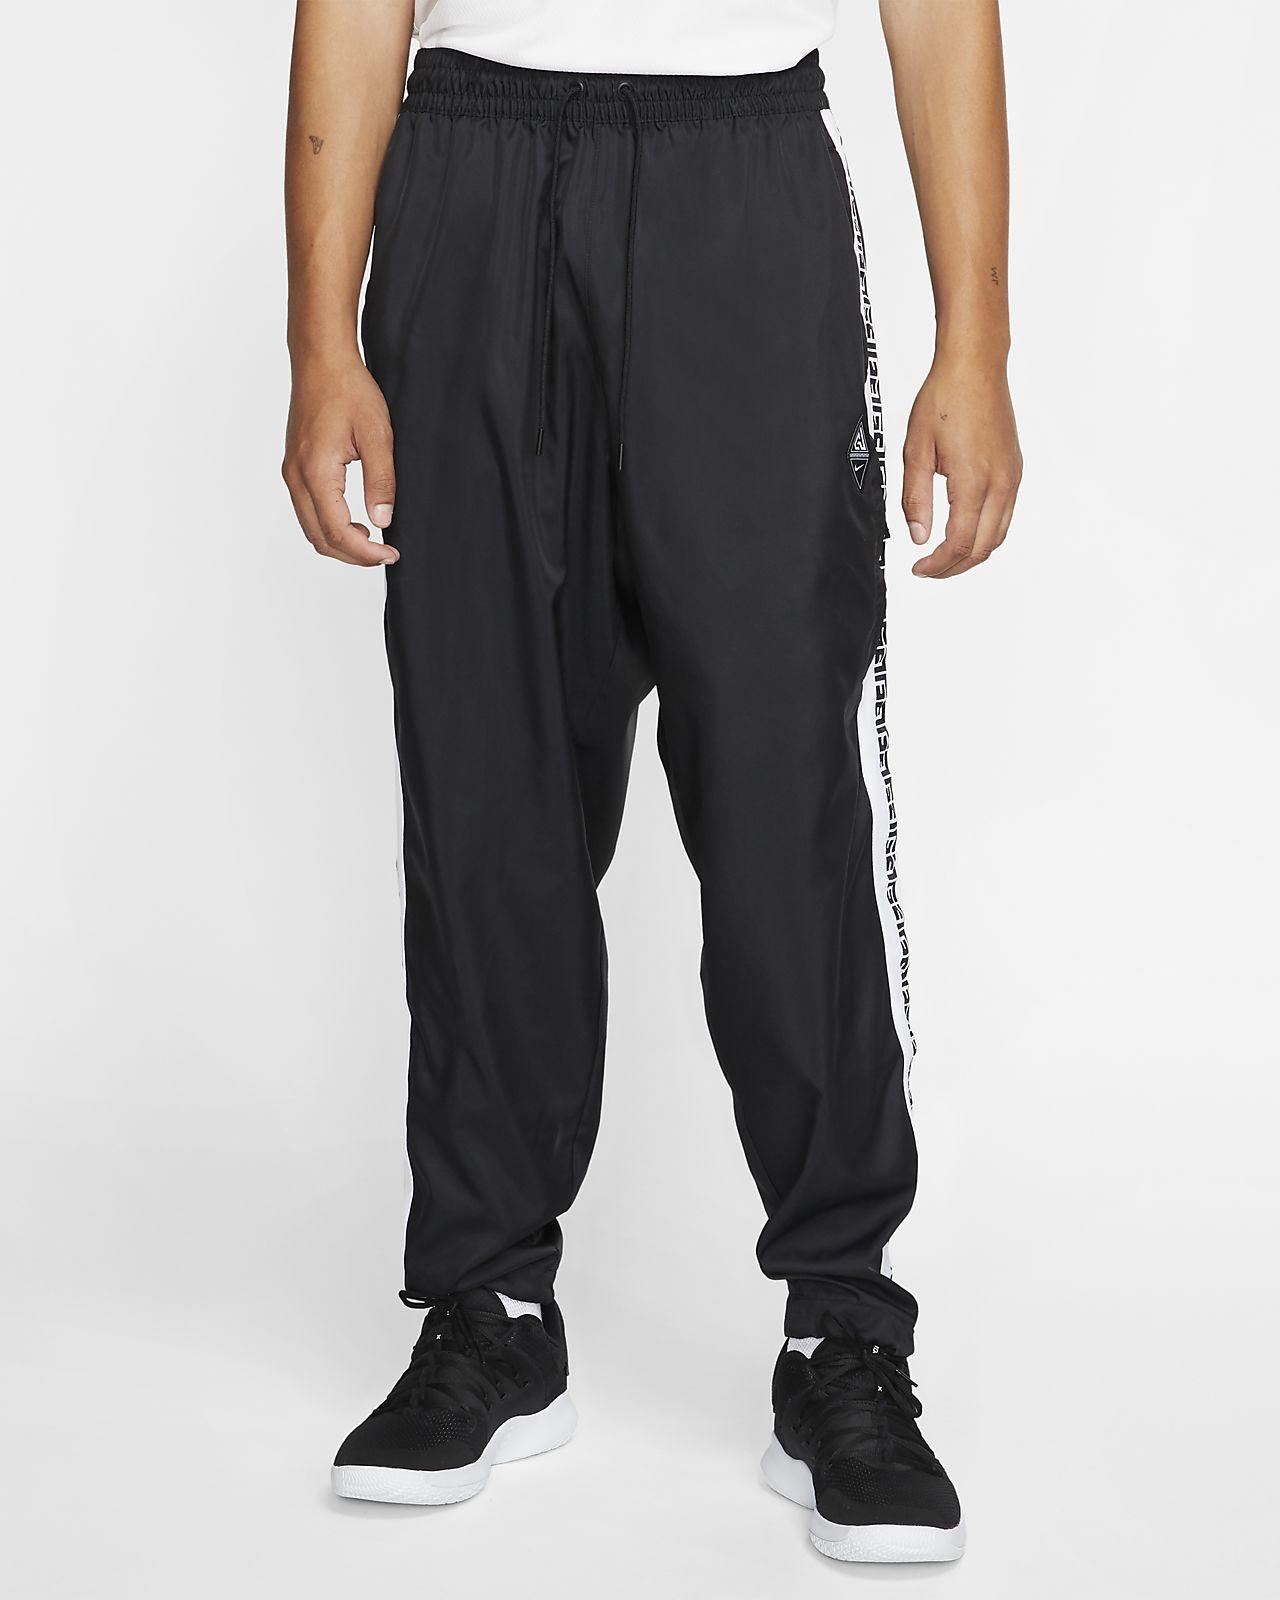 Men's Sweat, Tracksuit & Training Pants | adidas AU